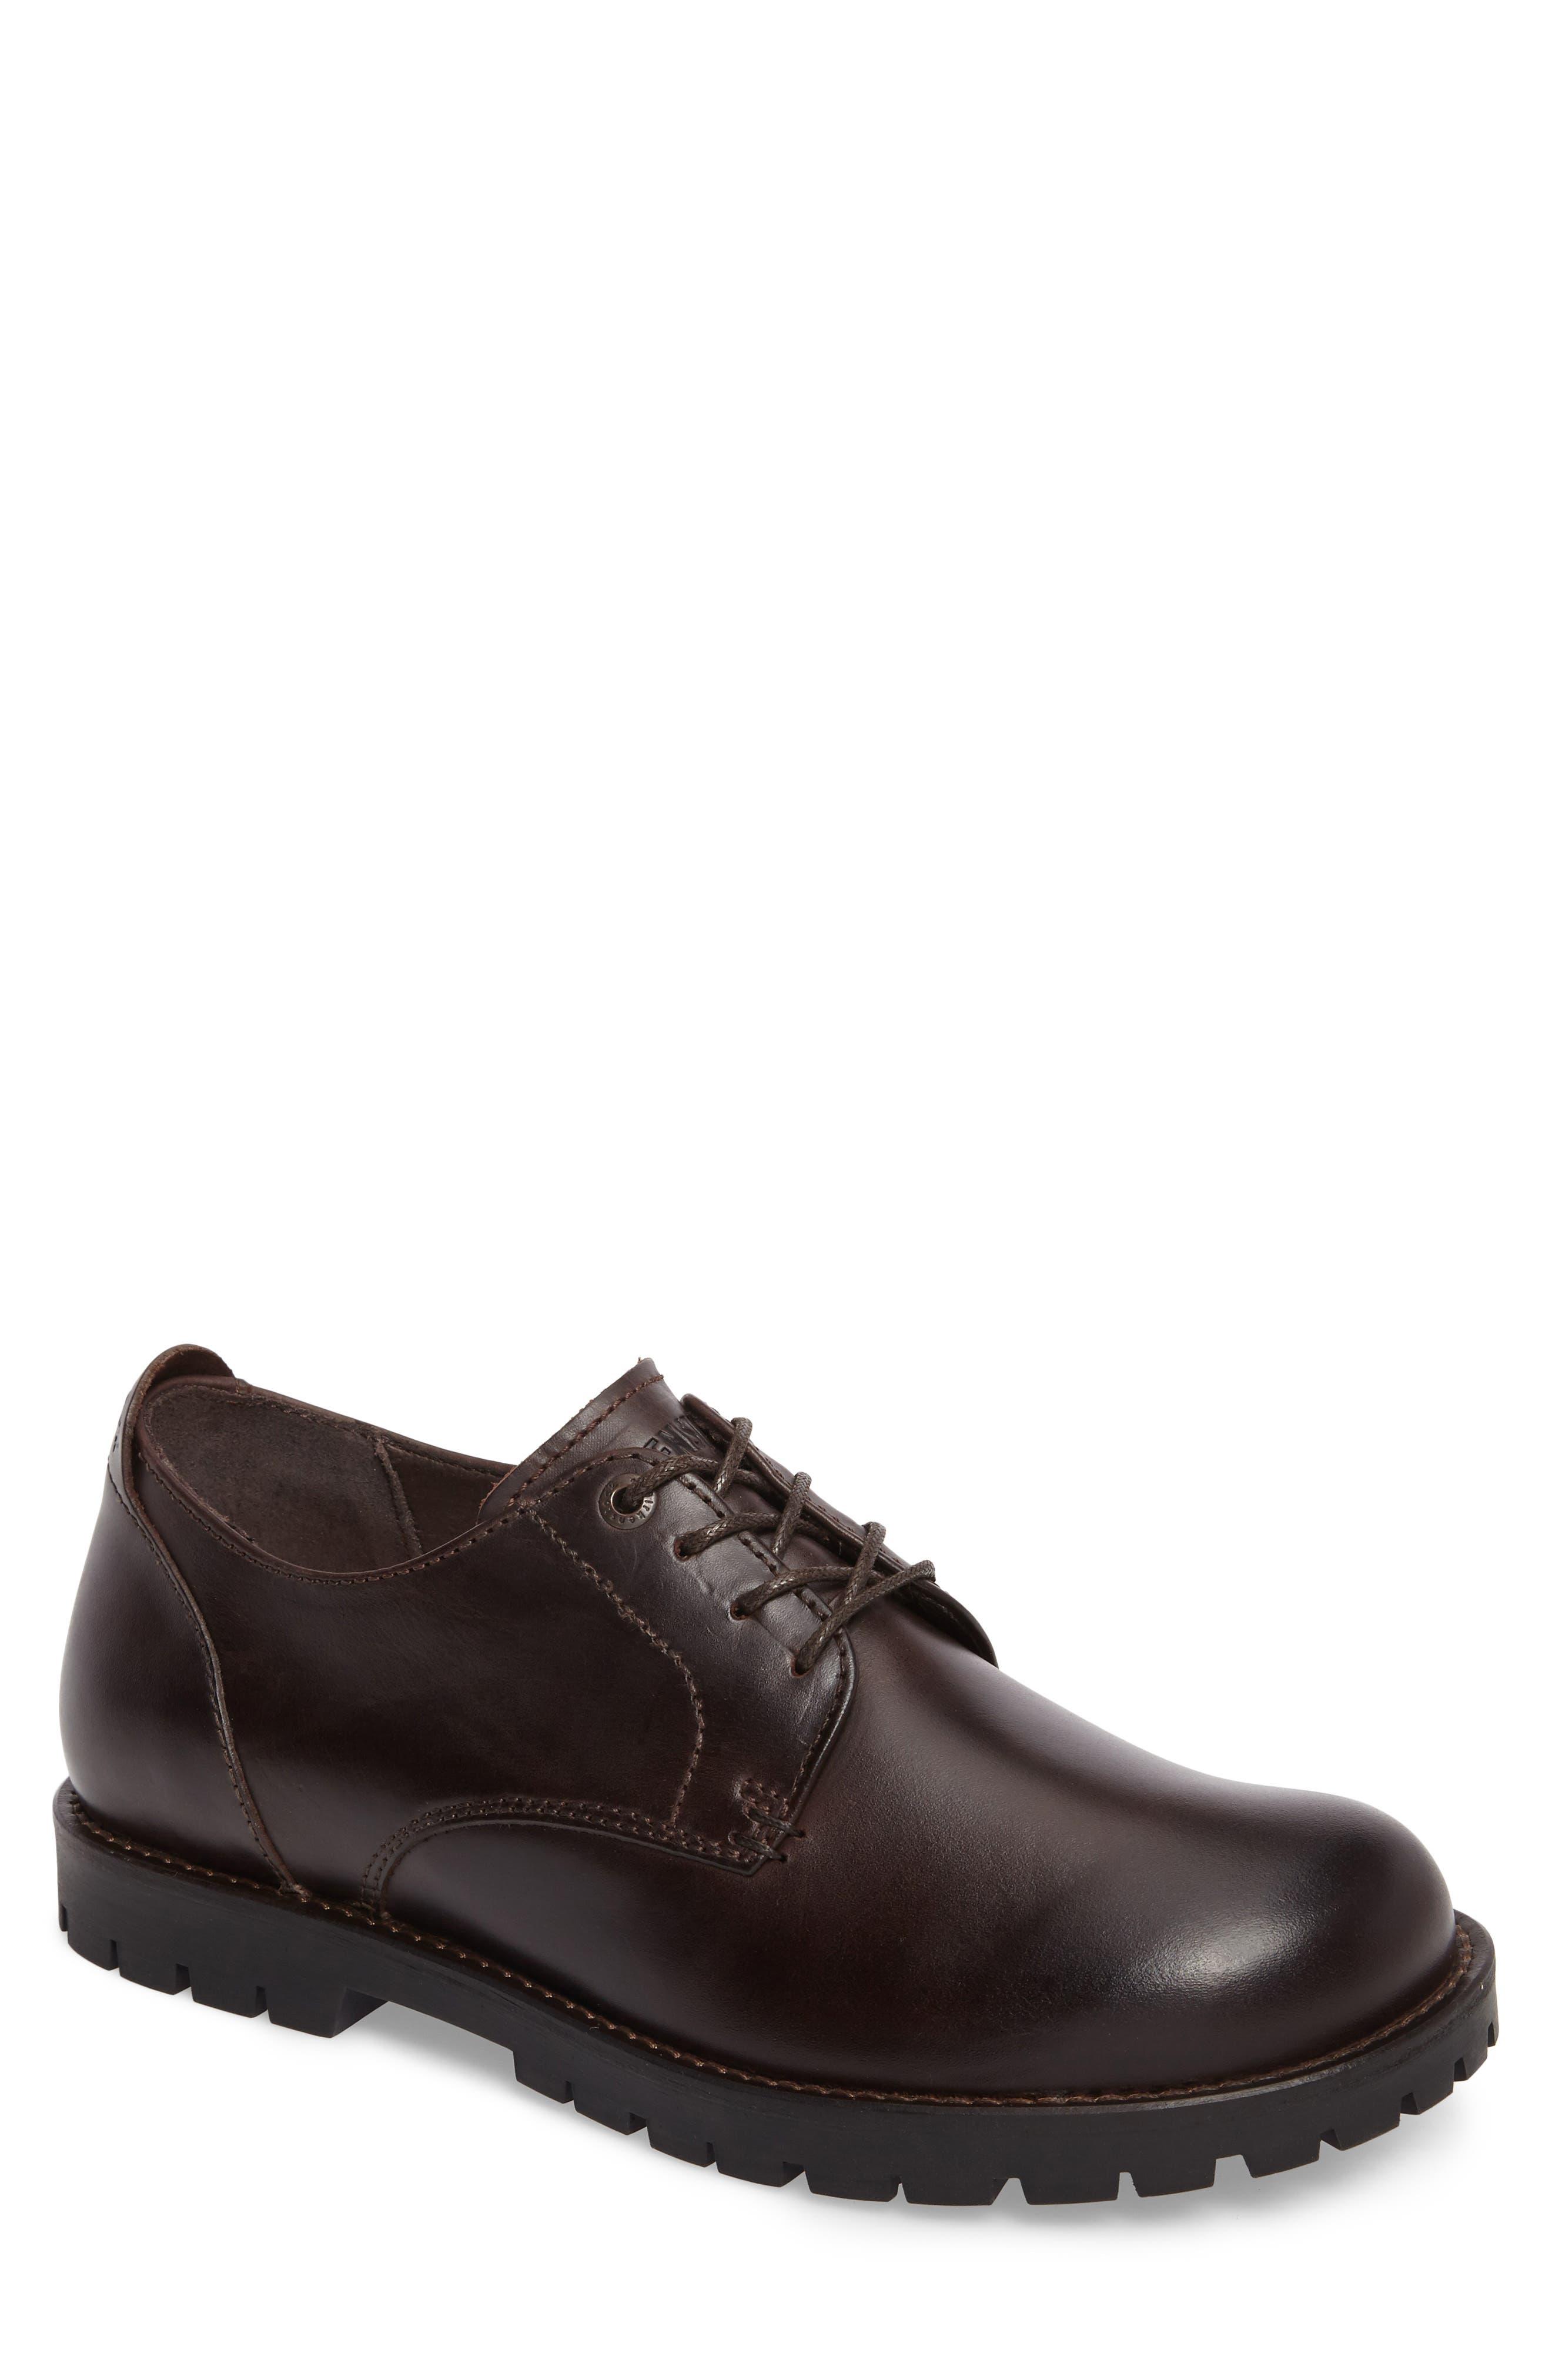 Birkenstock Gilford Plain Toe Derby (Men)